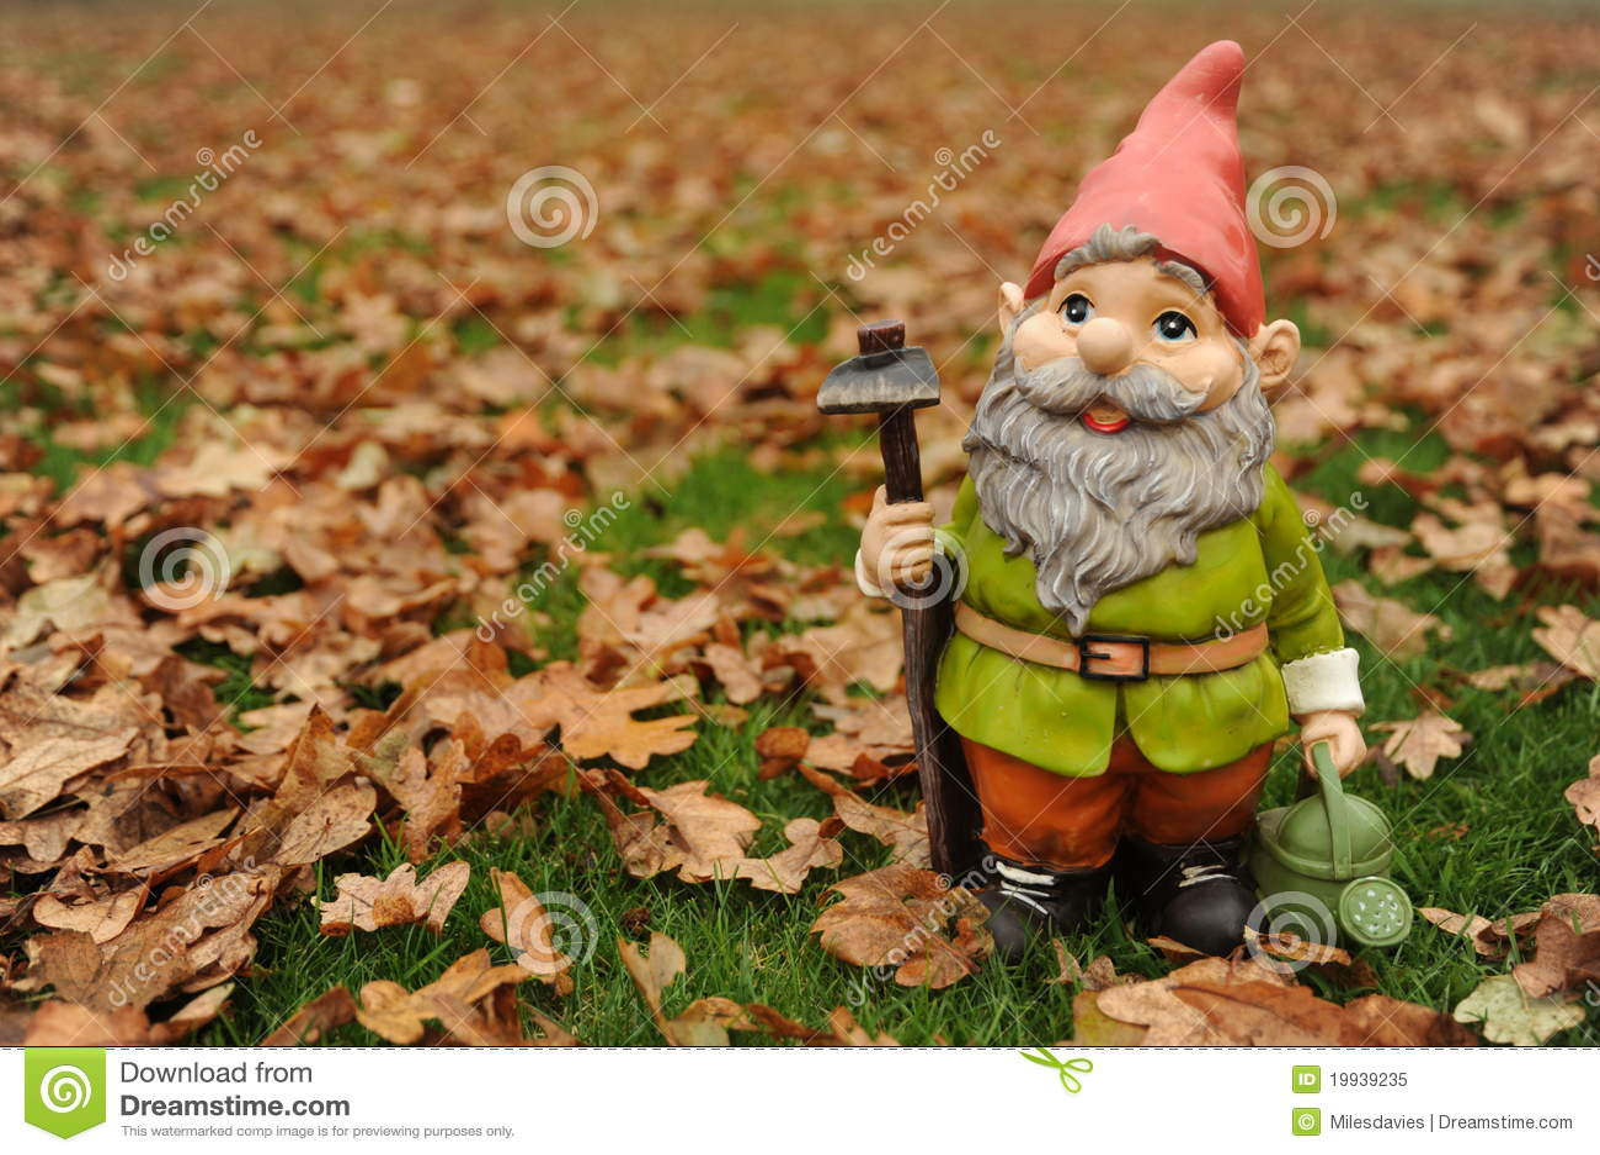 Autumn Garden Gnome Stock Photos - Download 95 Images